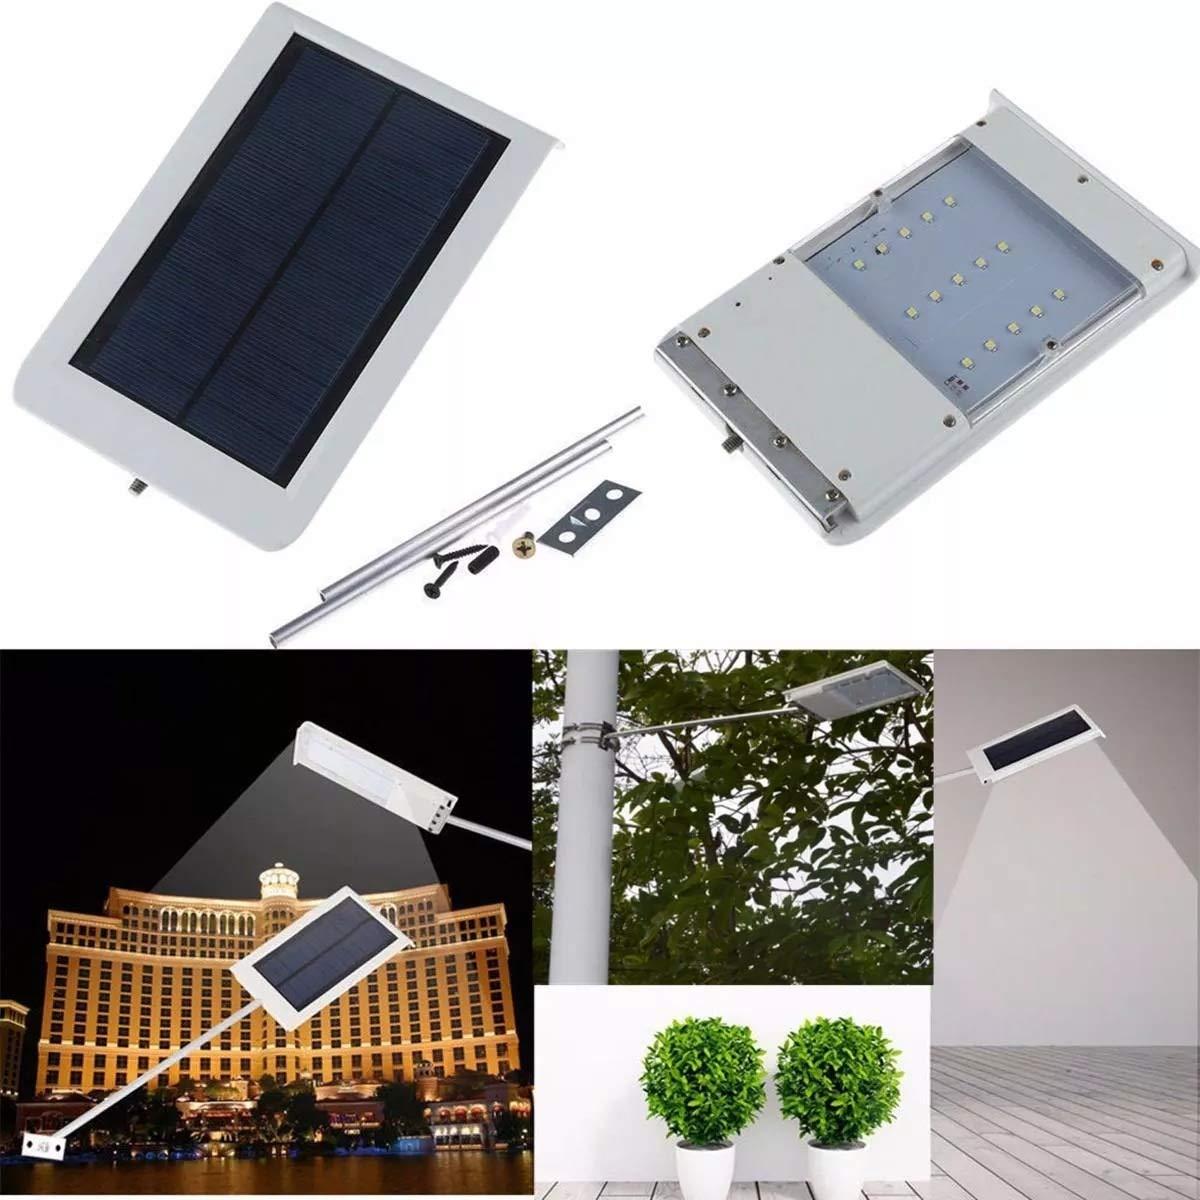 LPLCUICAN LED Bulbs 15 LED Solar Ultra Thin Light Sensor Wall Street Outdoor Waterproof Garden Lamp LED Light